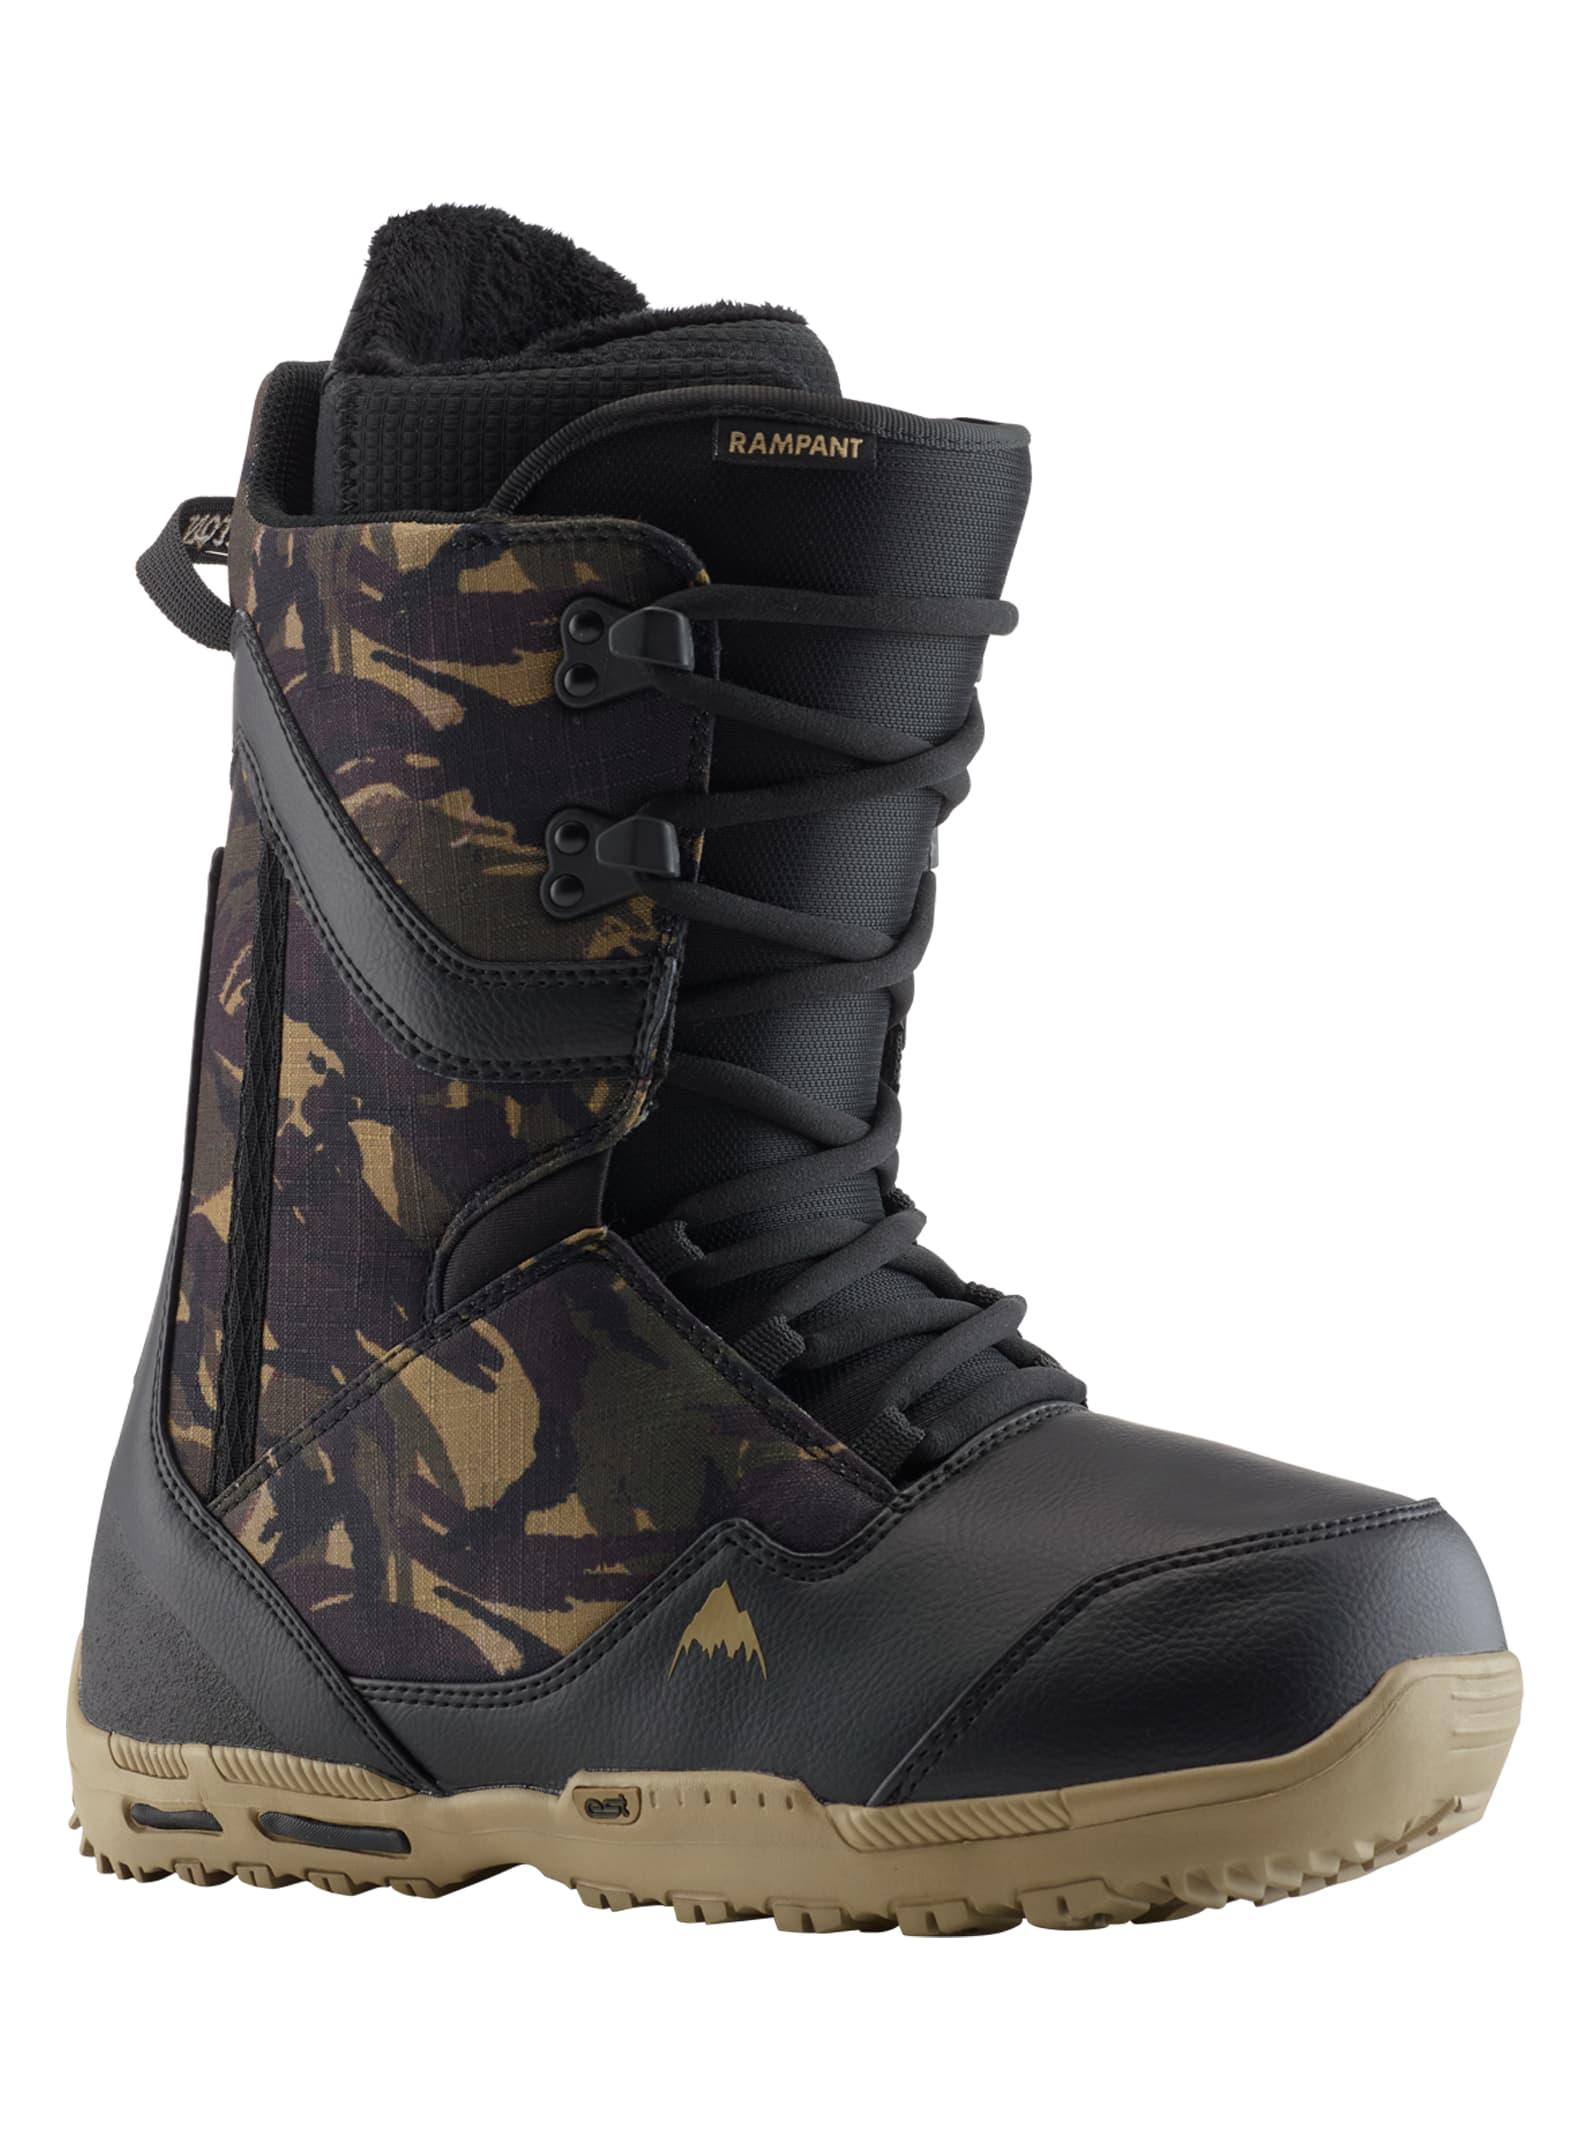 Burton Transfer Snowboard Boots 2014